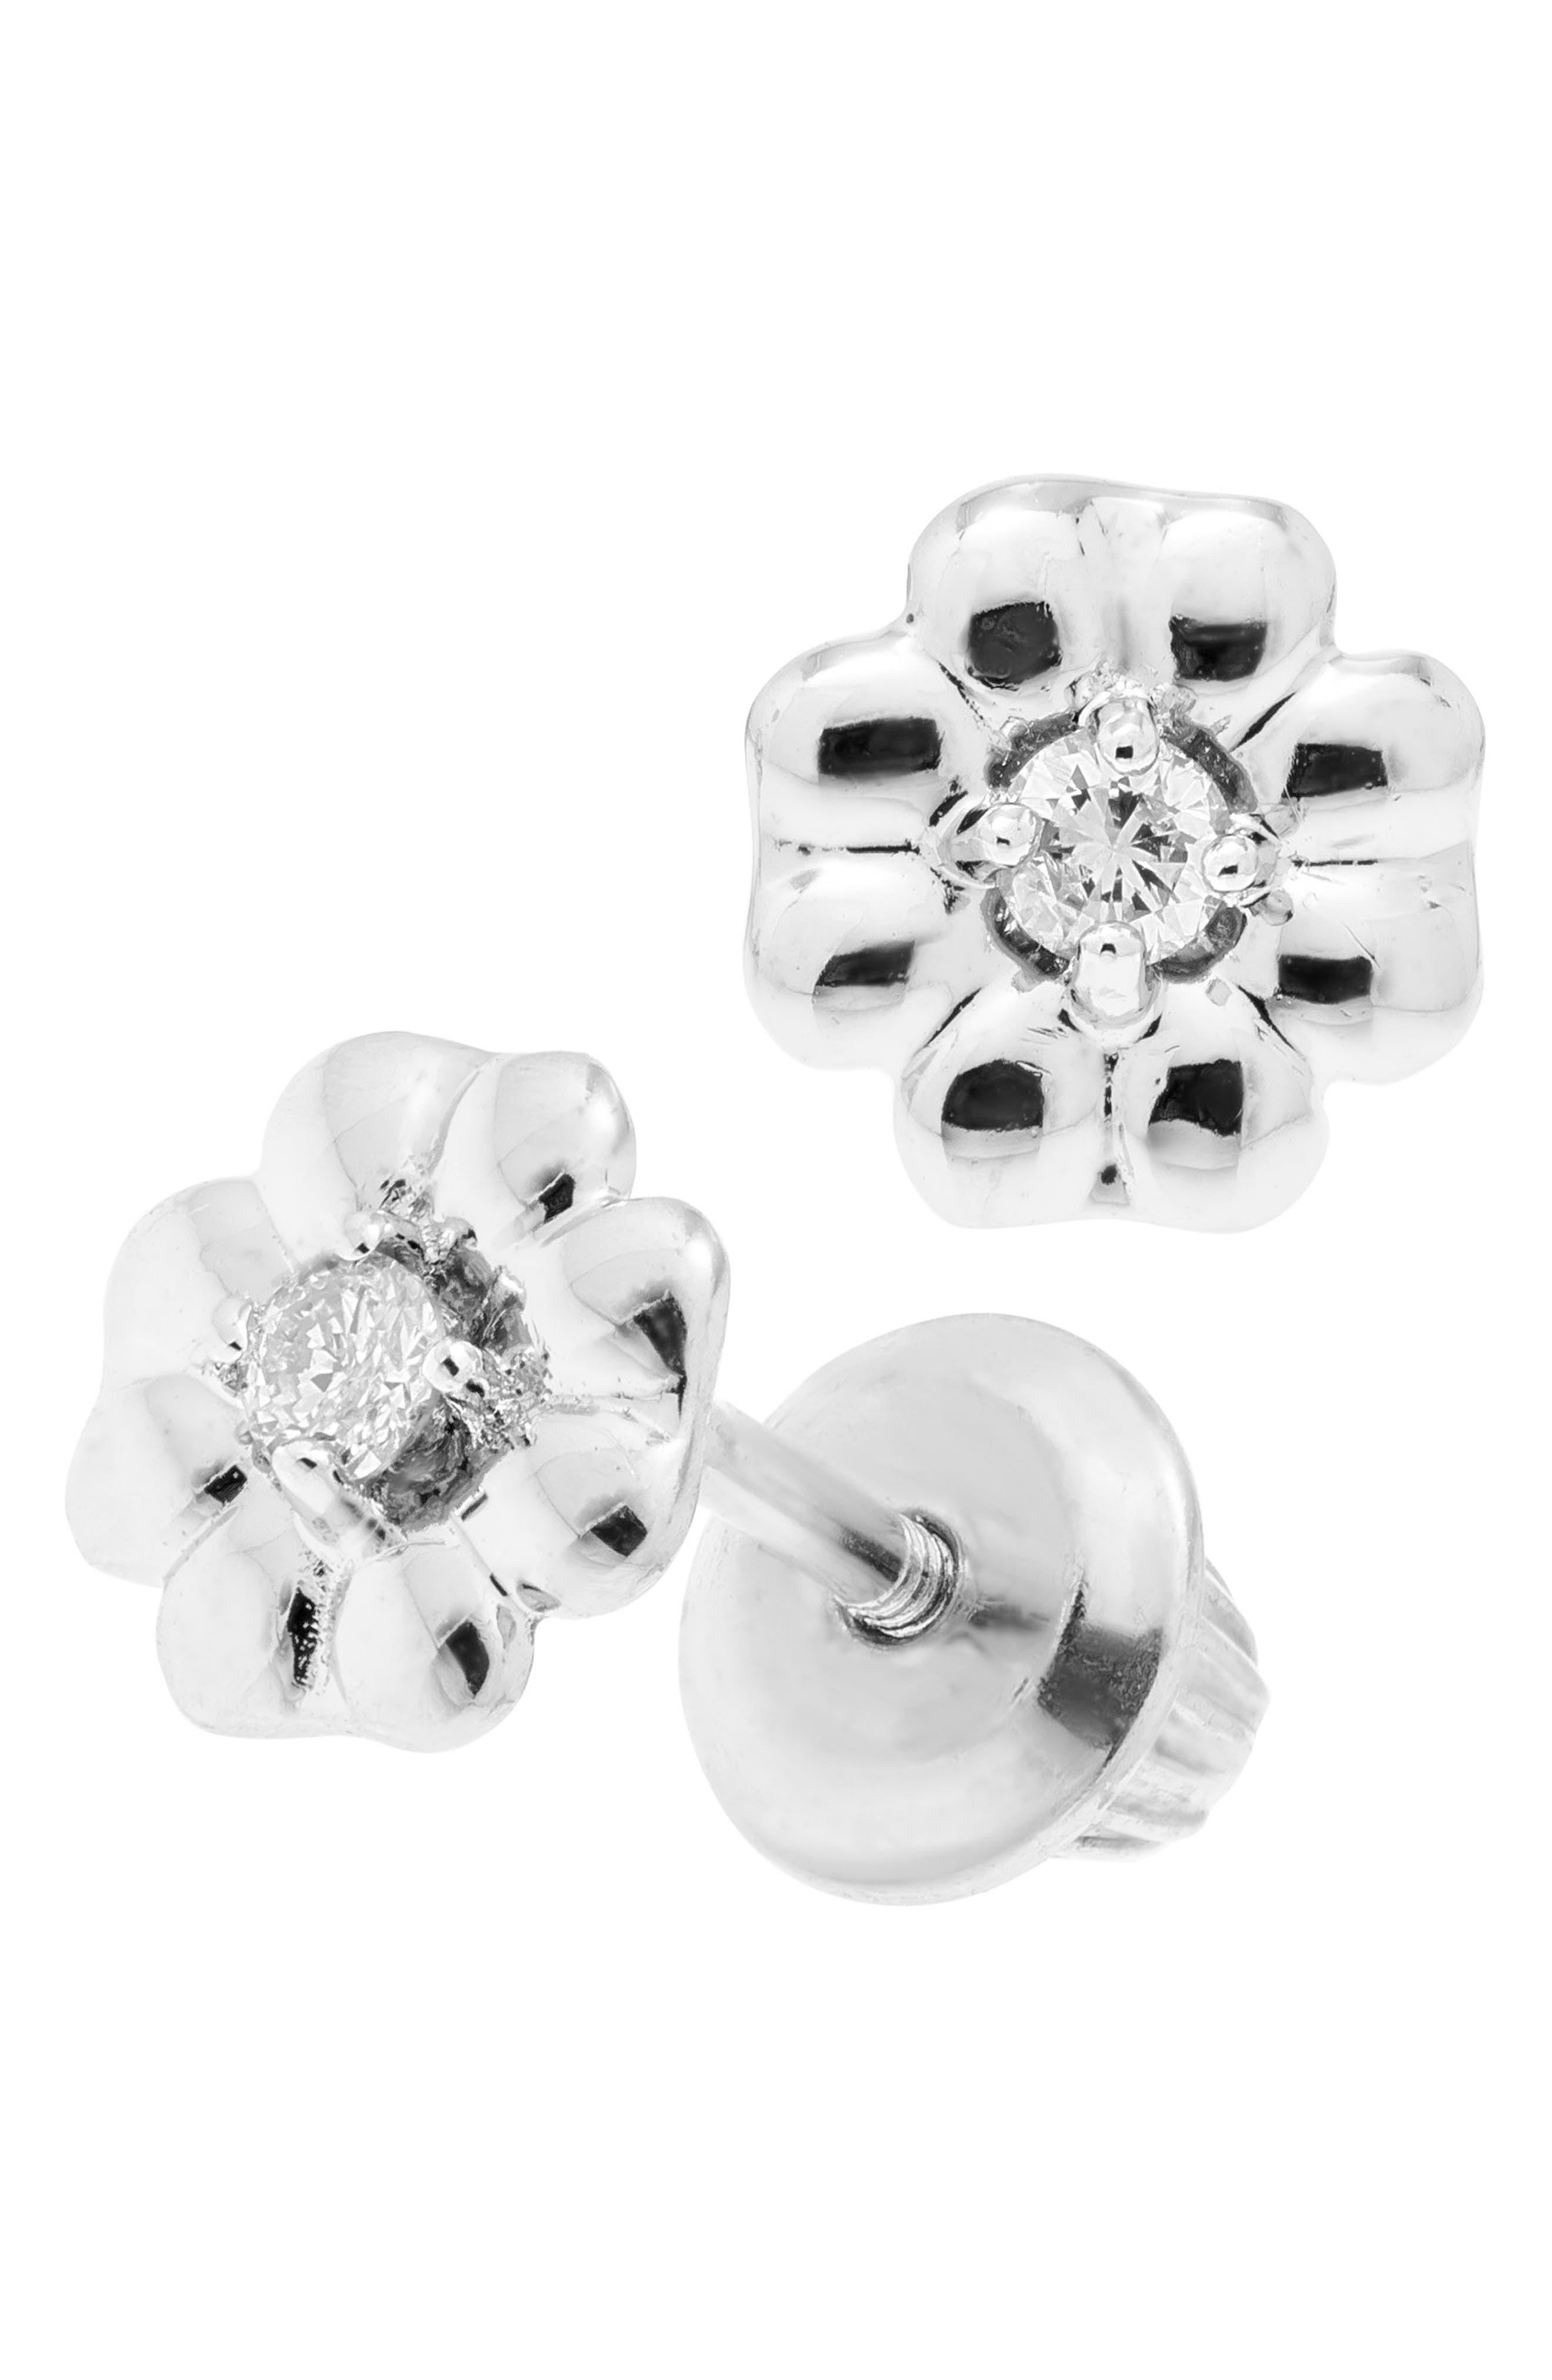 Sterling Silver & Diamond Stud Earrings,                         Main,                         color, Silver